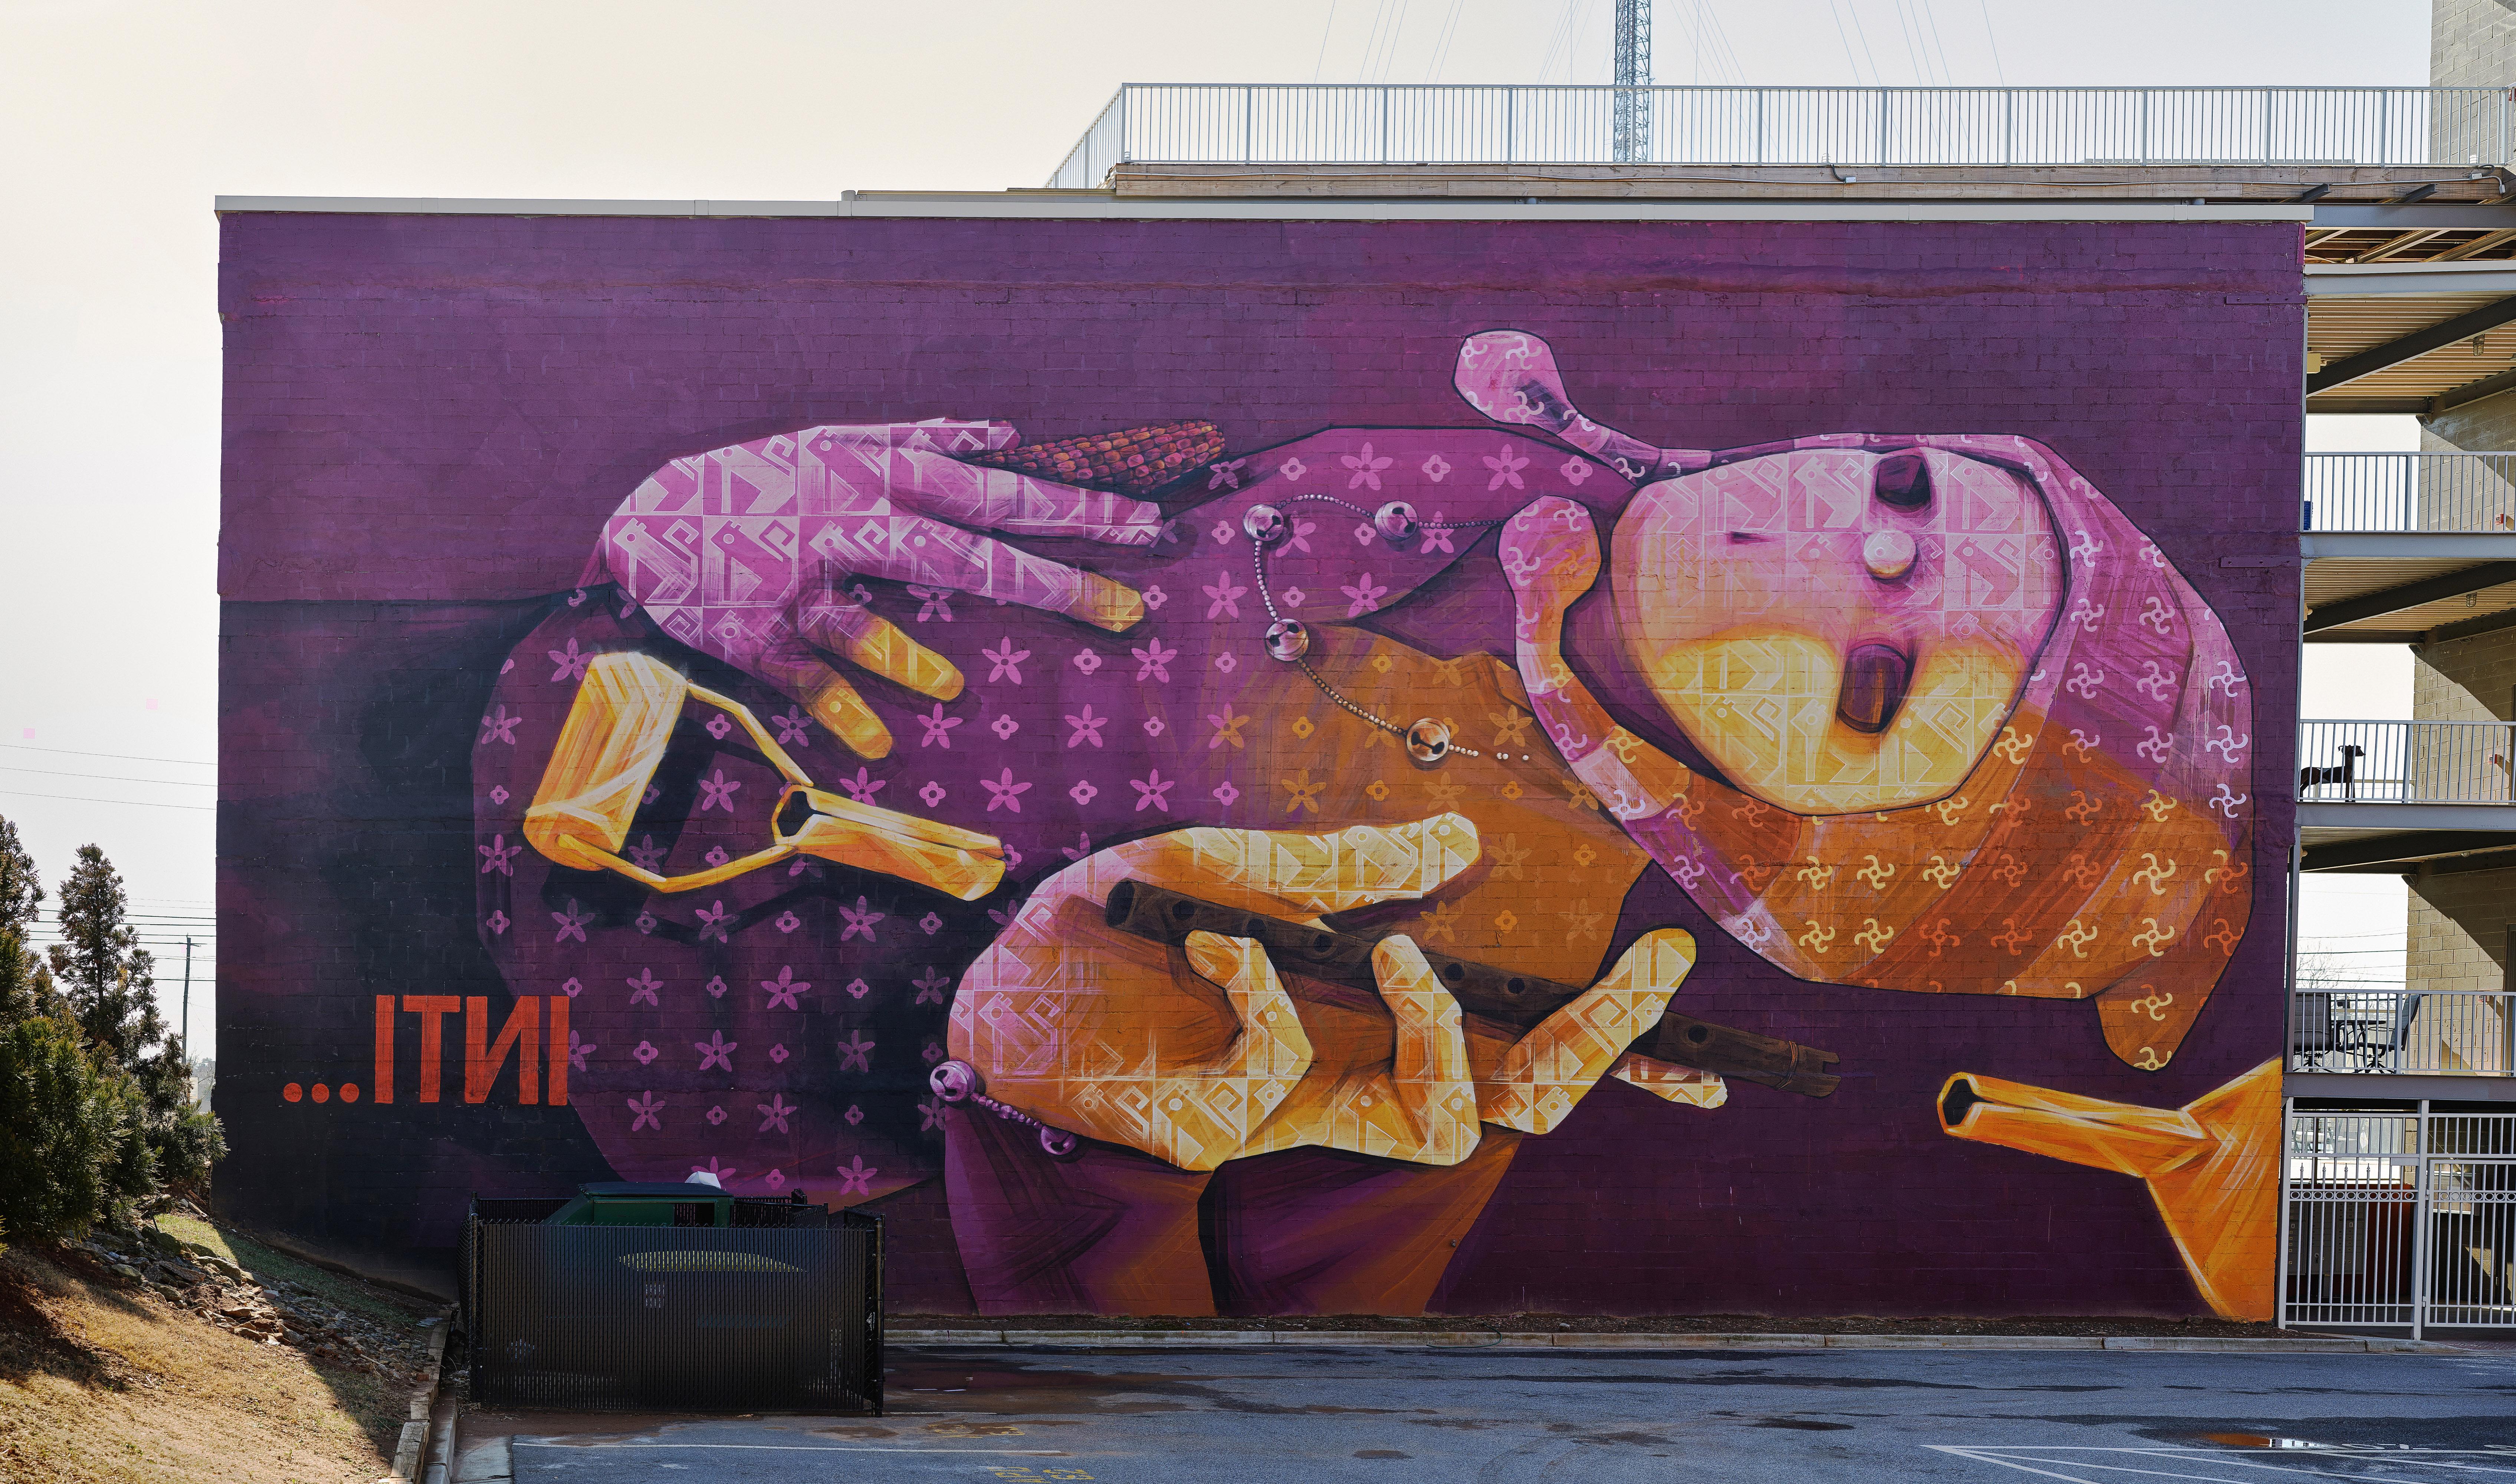 Chilean artist INTI on Reynoldstown Crossing, Atlanta for Living Walls 2013.